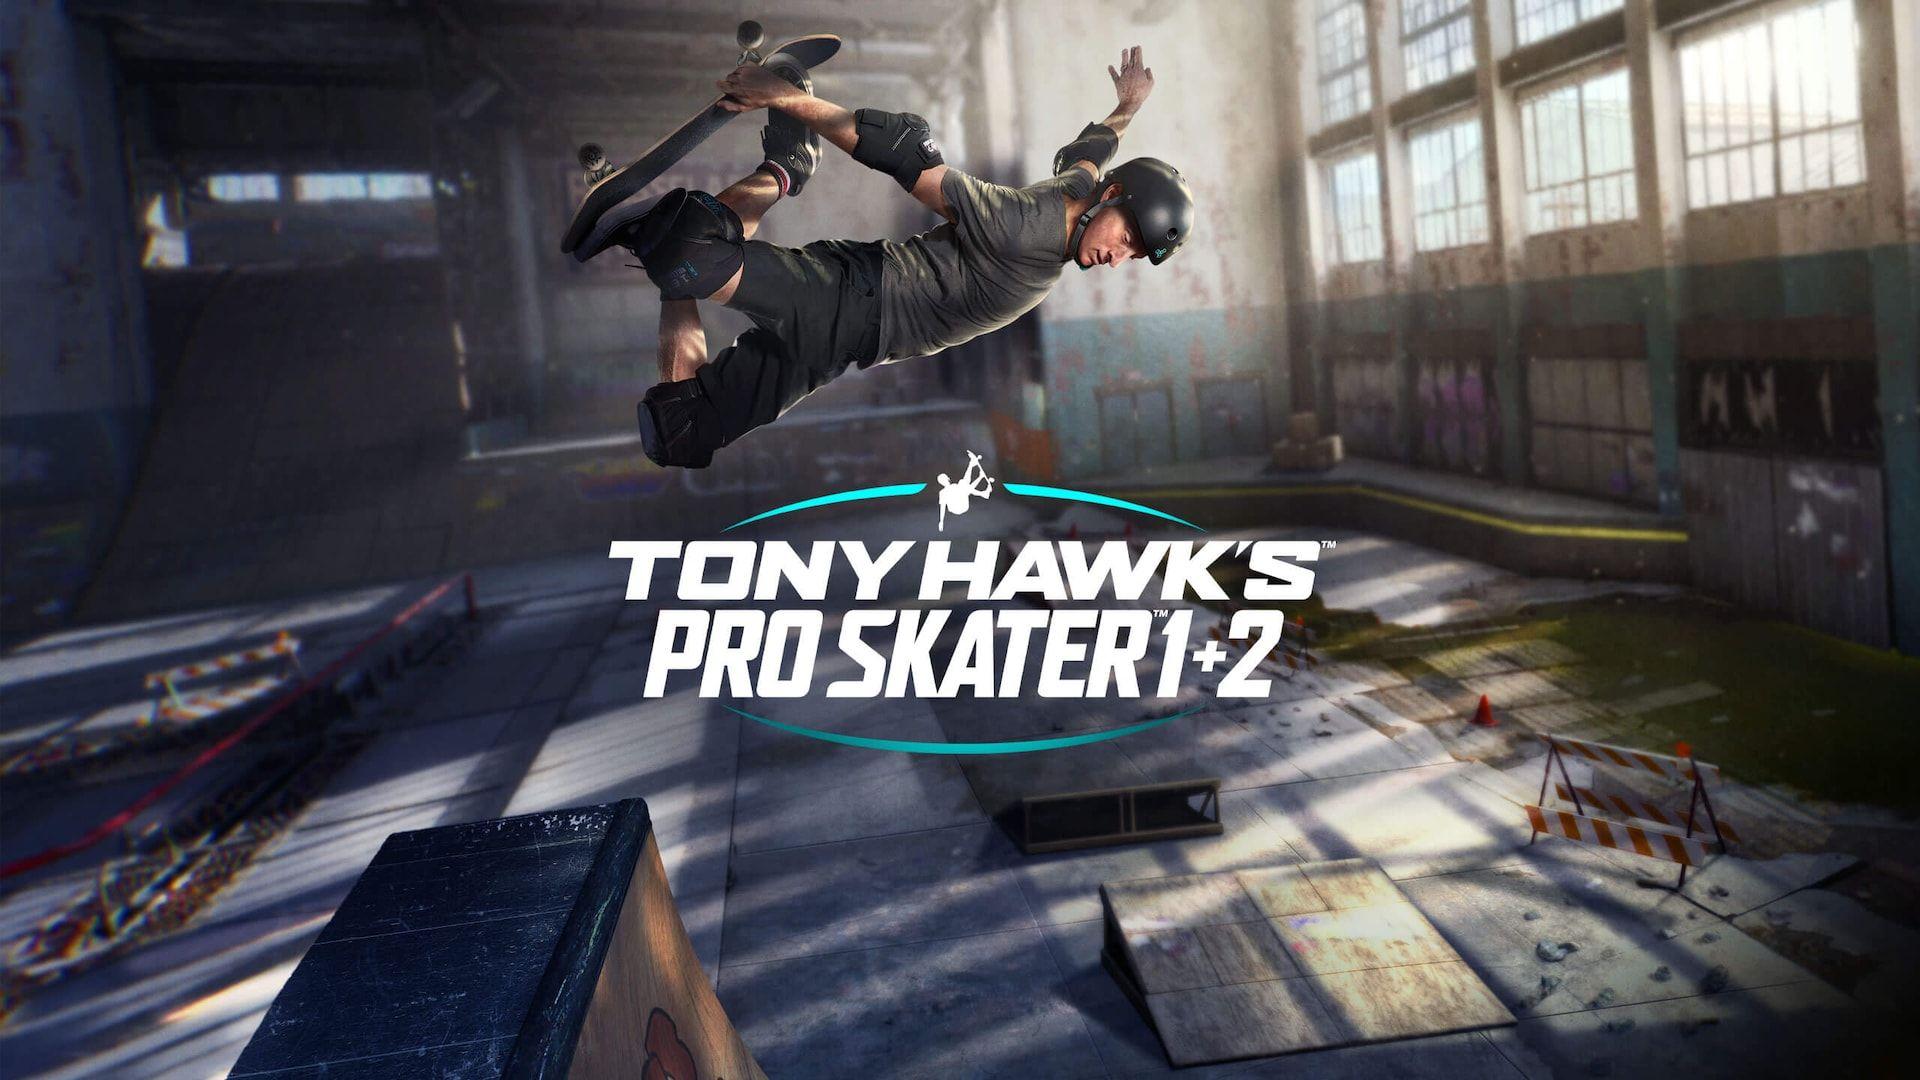 /tony-hawk-nintendo-switch-pro-skater-12-arriving-june-i813343r feature image